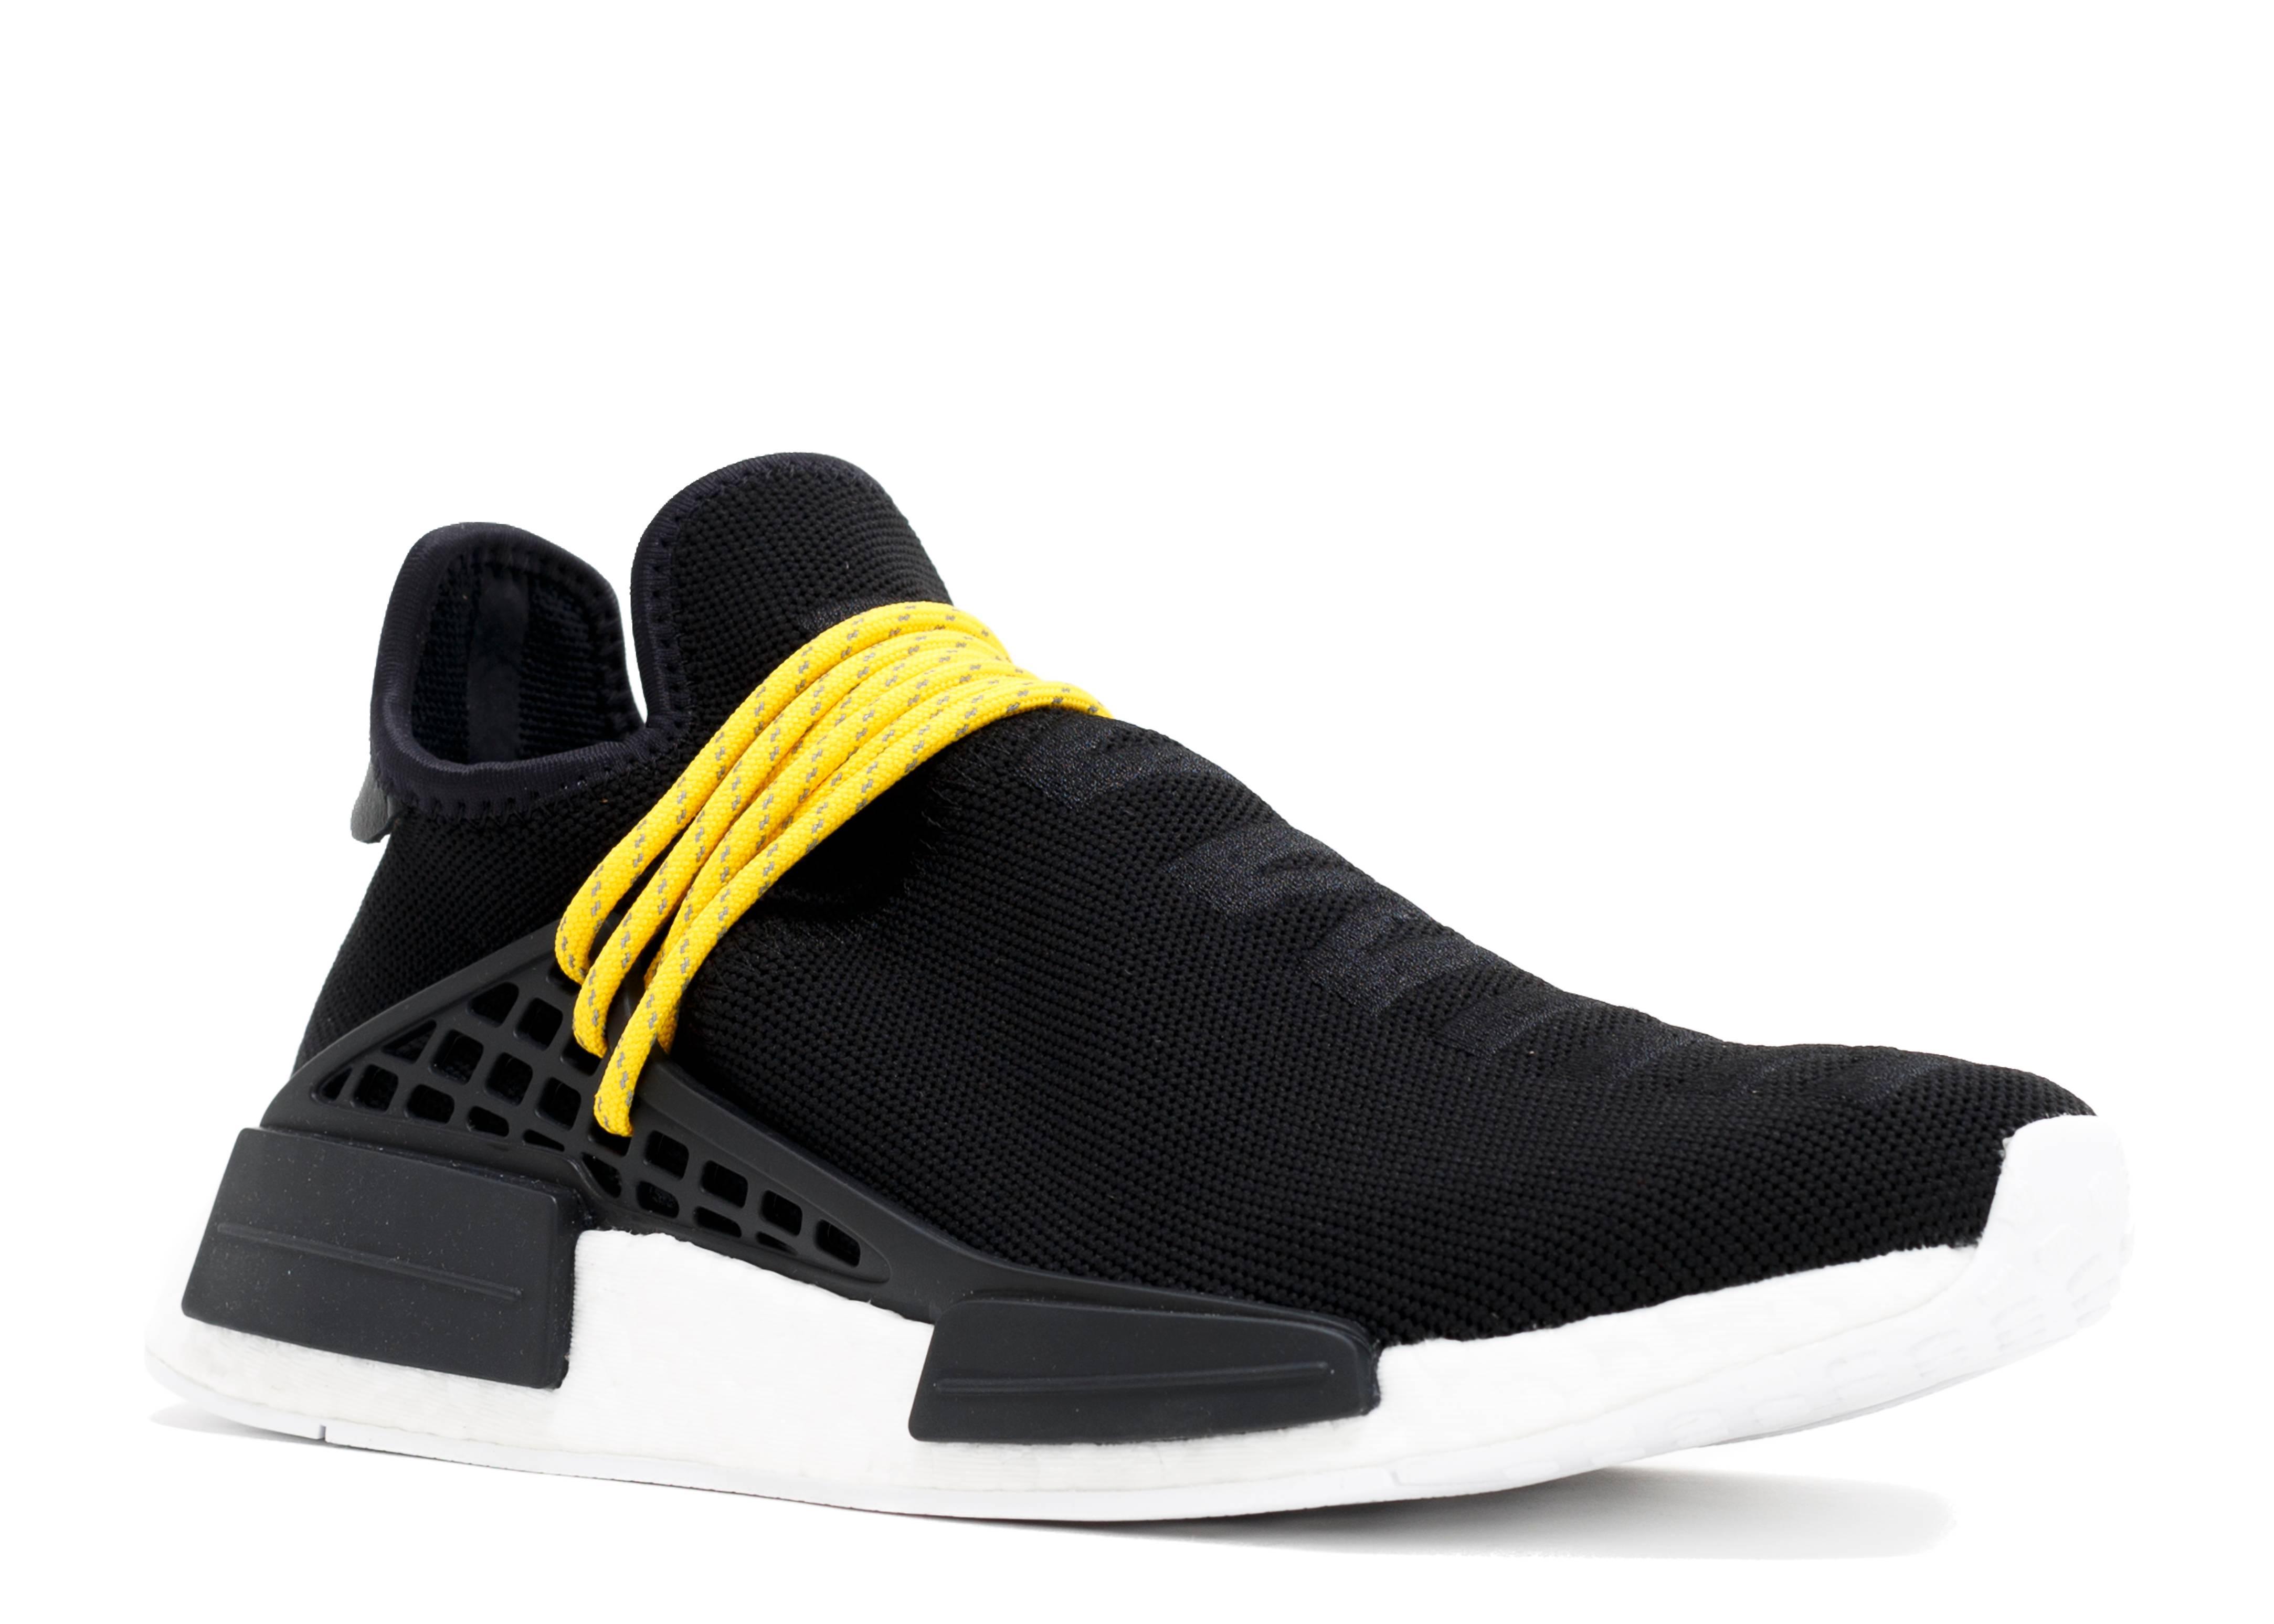 Adidas Human Race Nmd Black